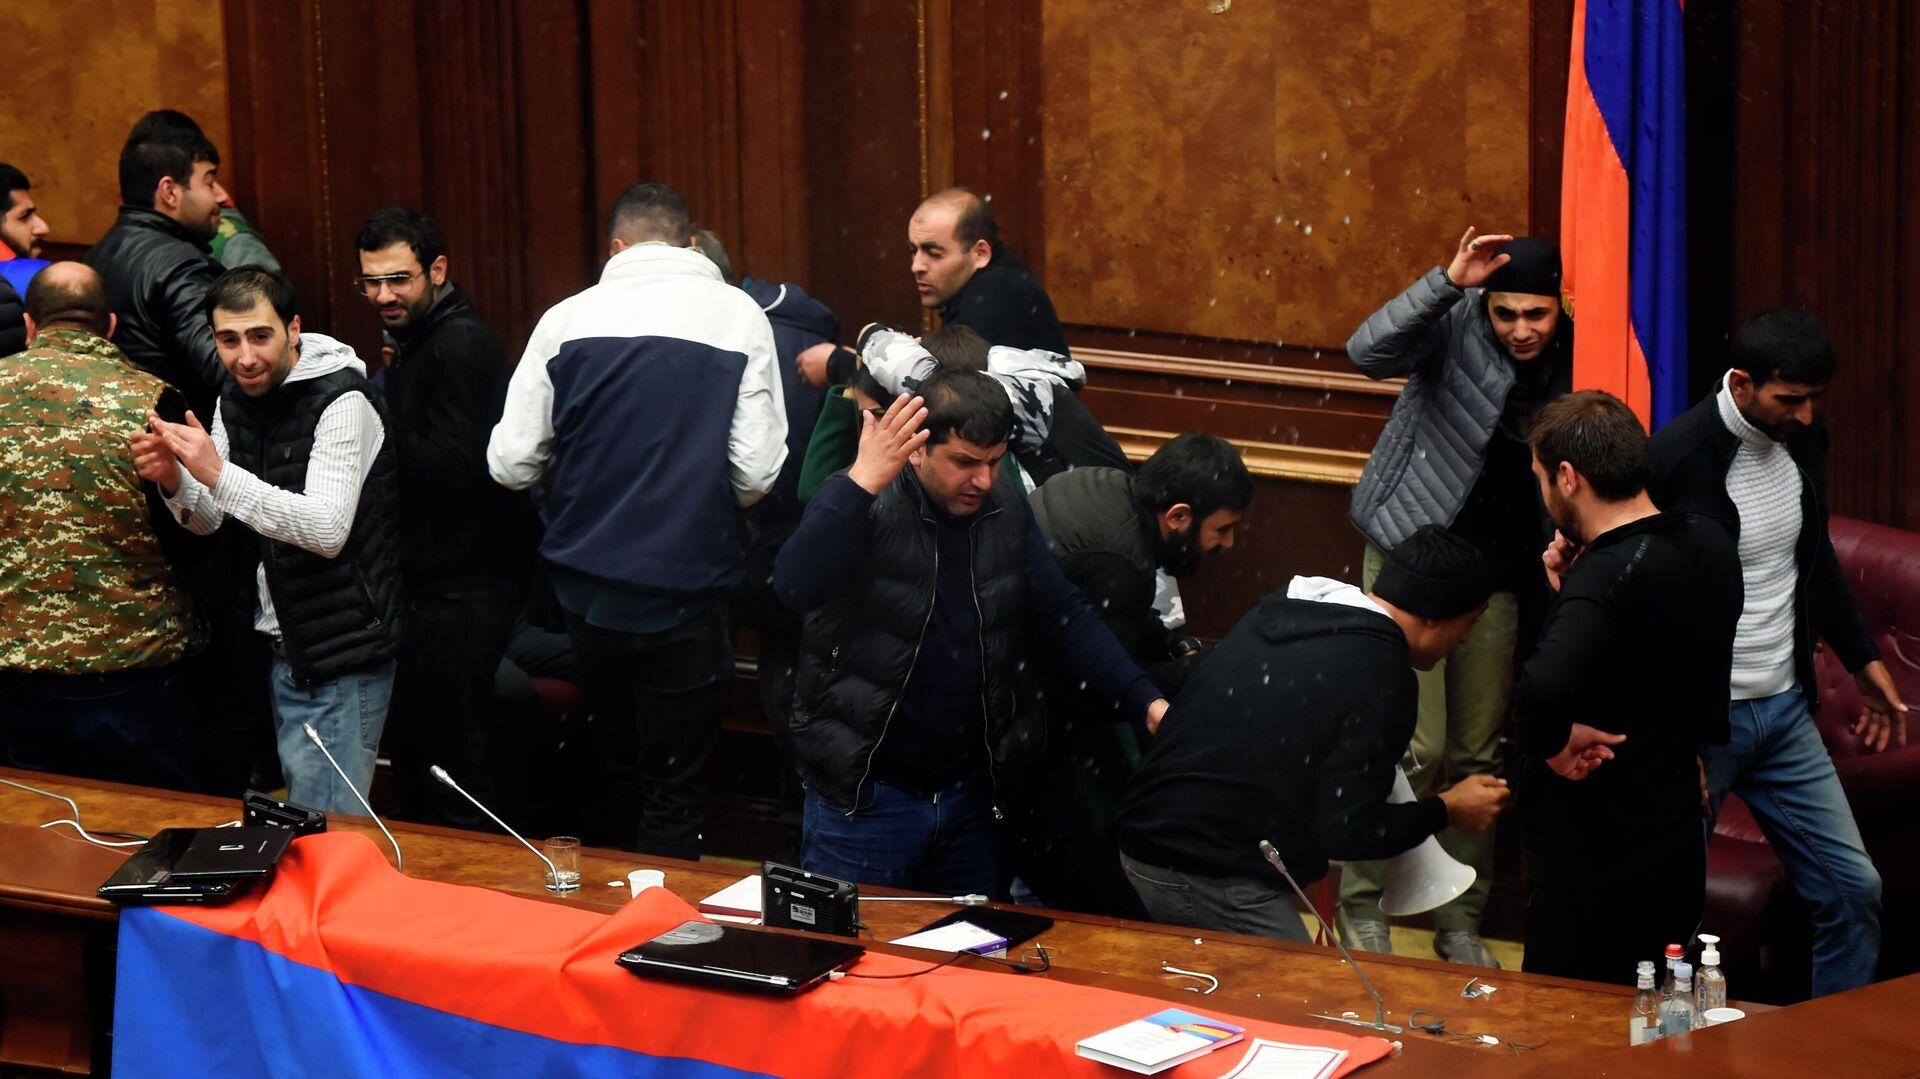 Участники акции протеста в одном из залов в здании парламента Армении в Ереване - РИА Новости, 1920, 02.12.2020